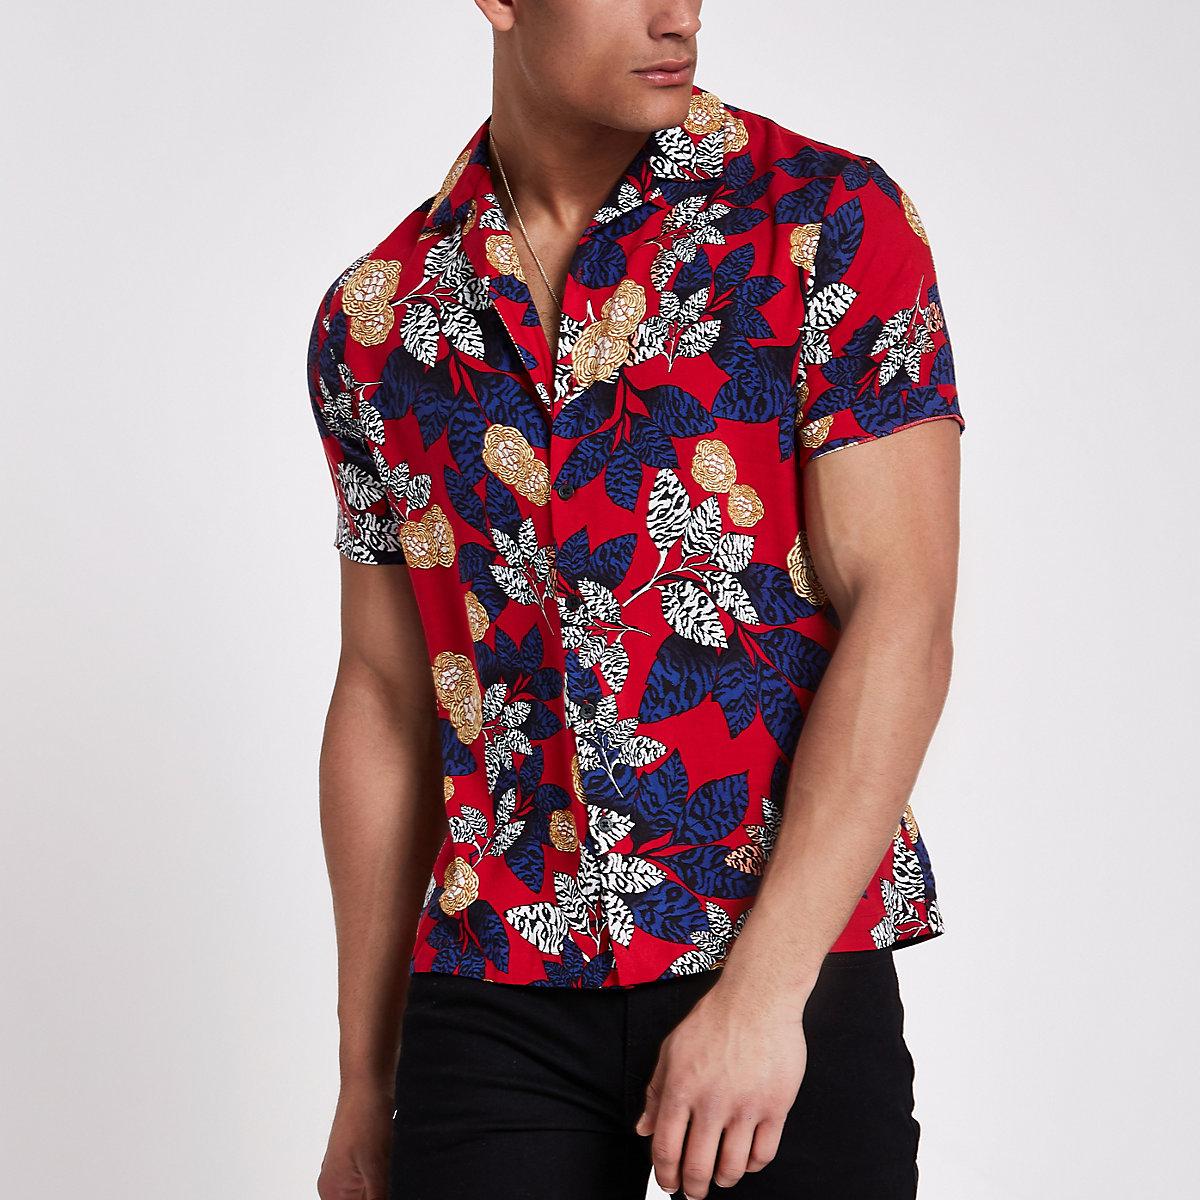 Red floral revere short sleeve shirt